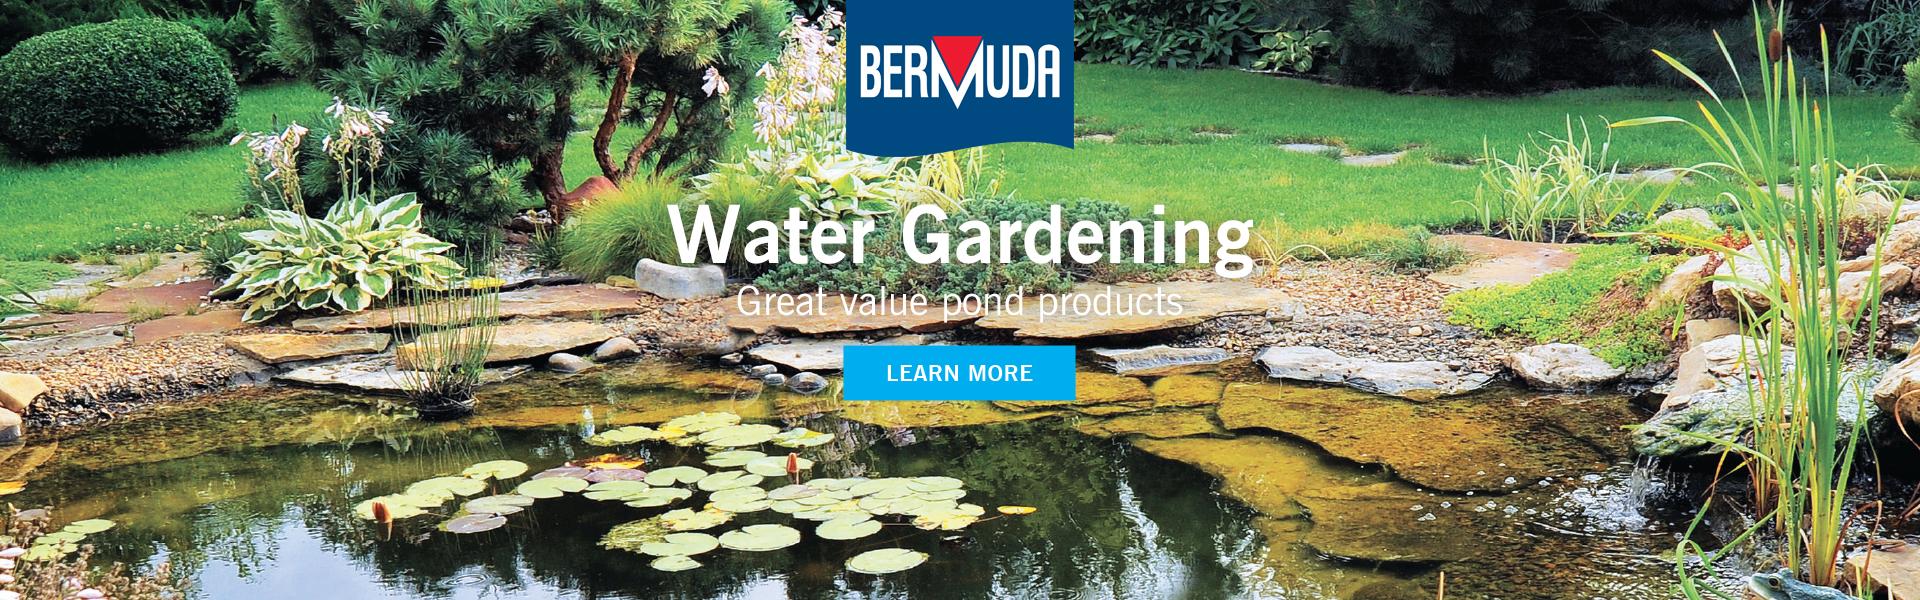 Bermuda Water Gardens